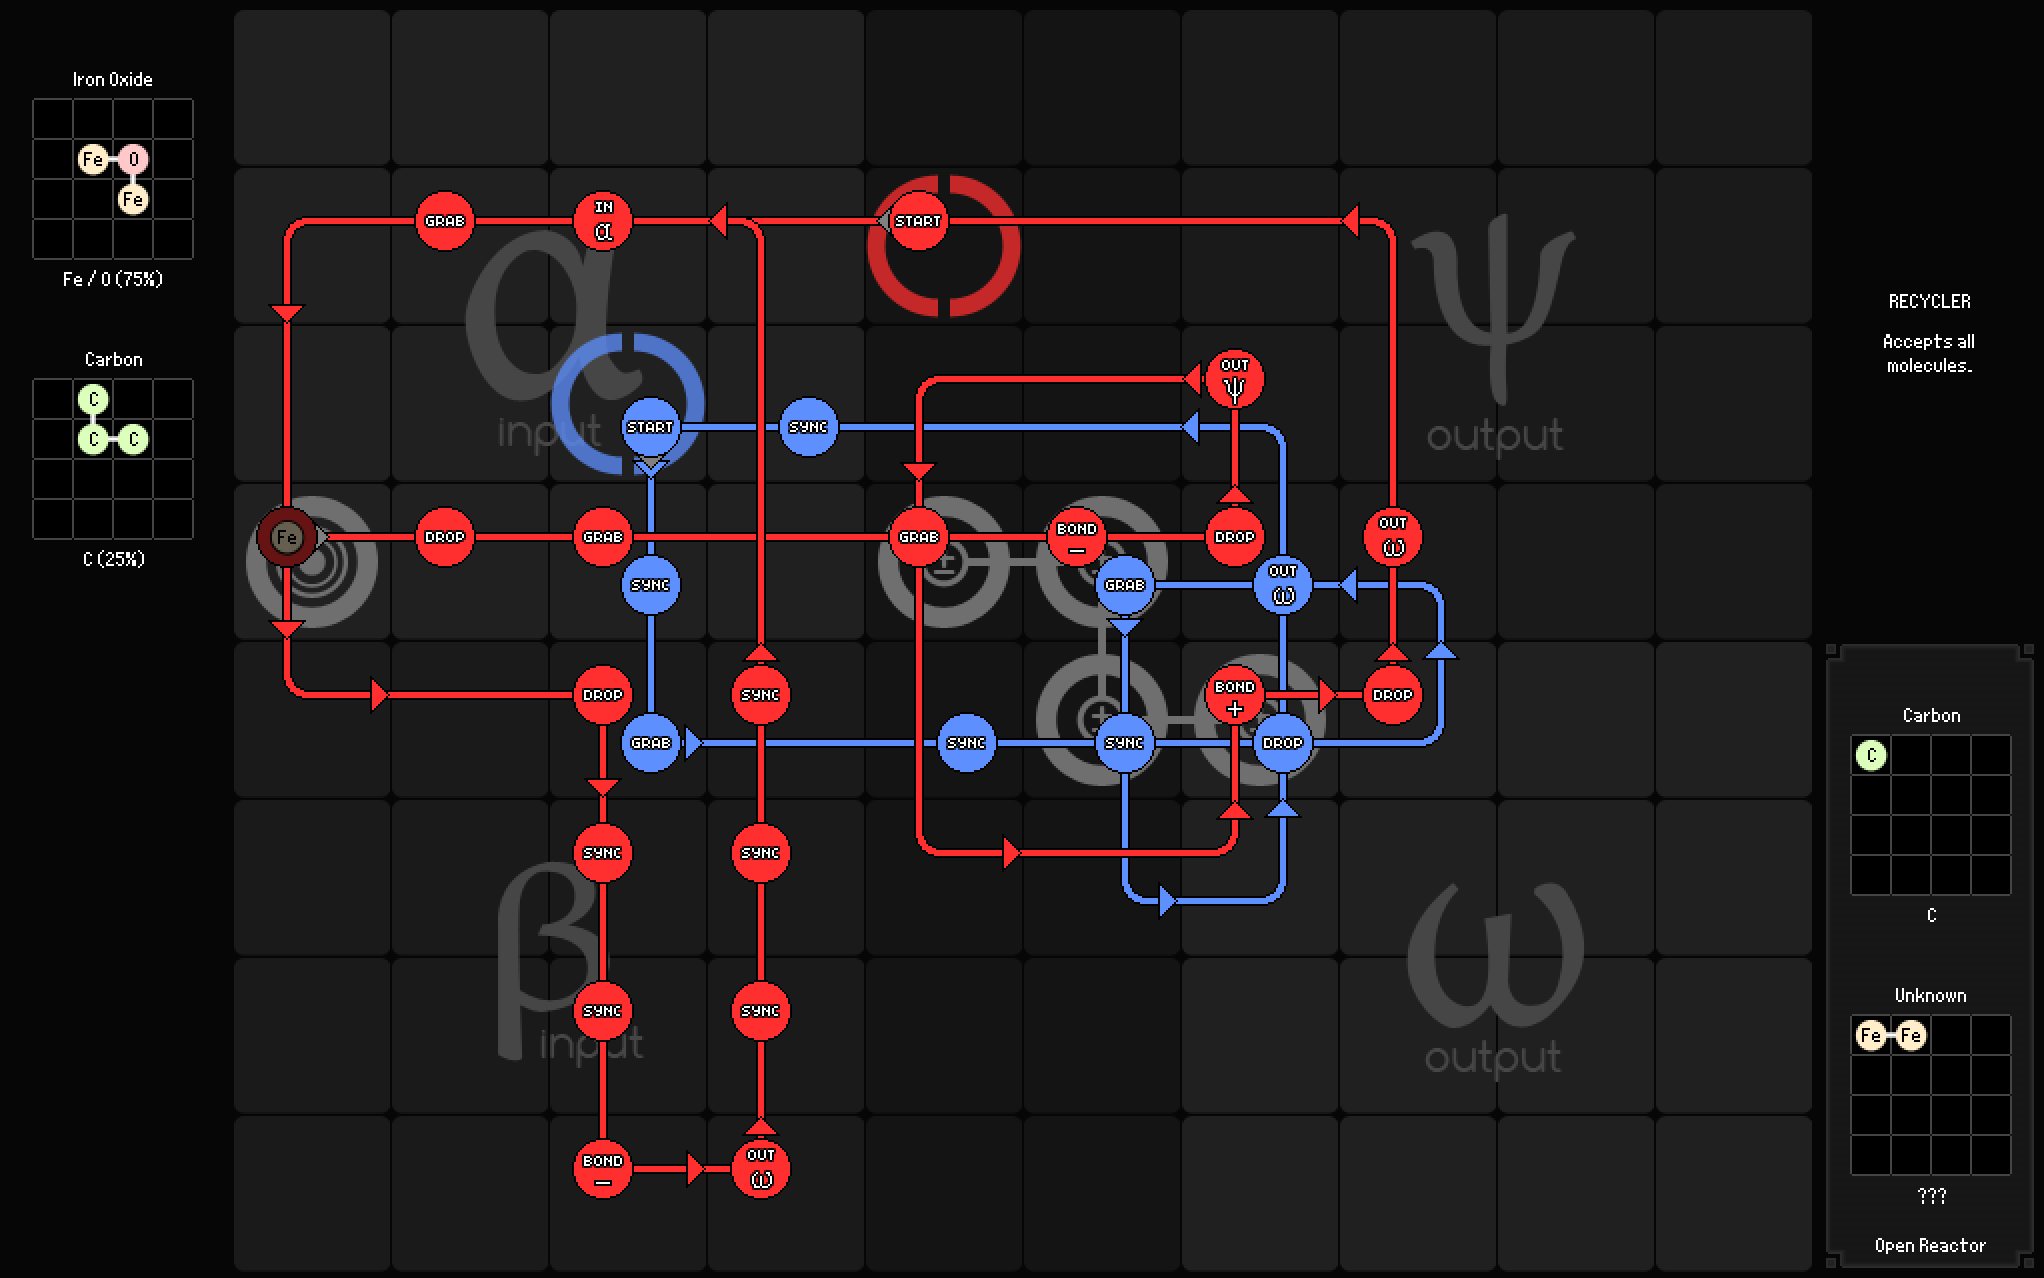 1_Story_Mode/6_Hephaestus_IV/SpaceChem-6.5.a/Reactor_1.png